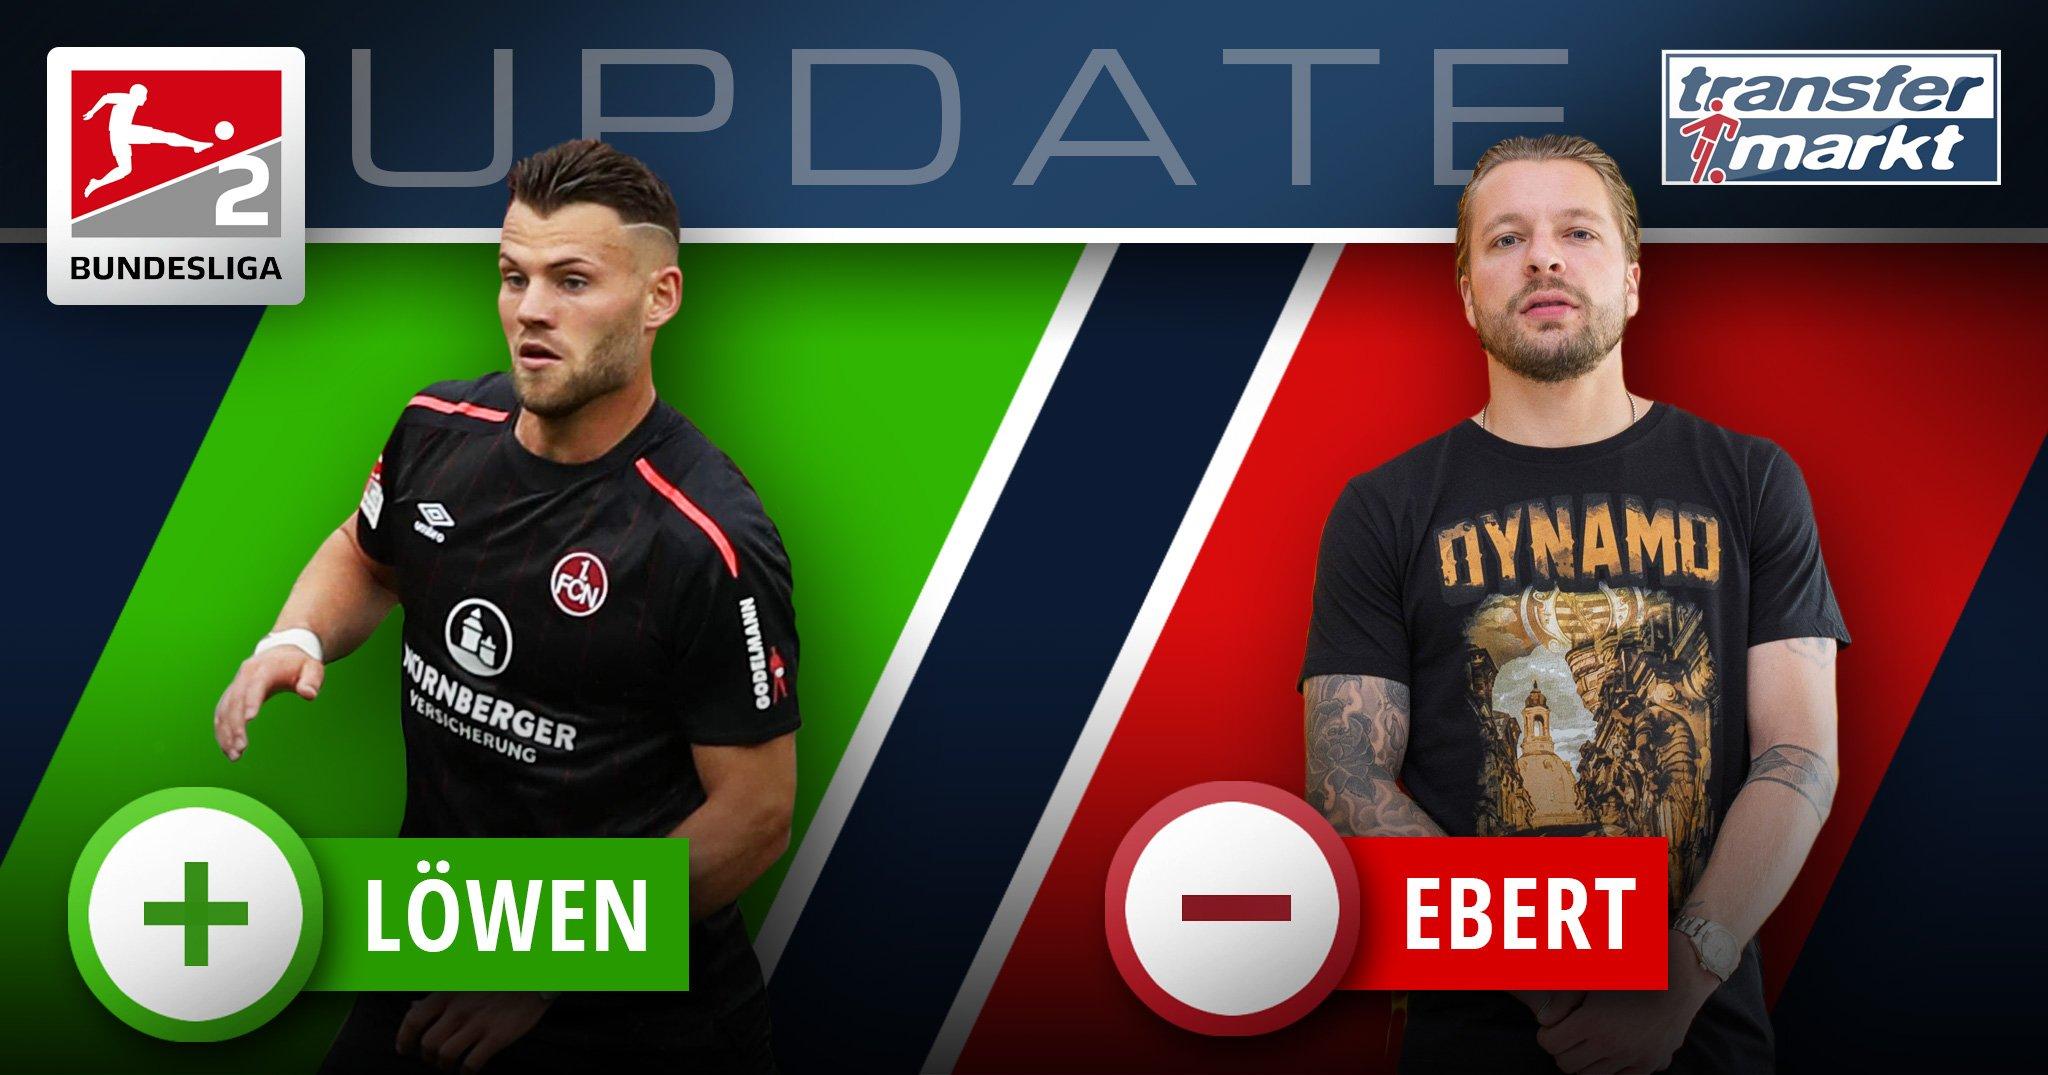 2 Bundesliga Transfermarkt